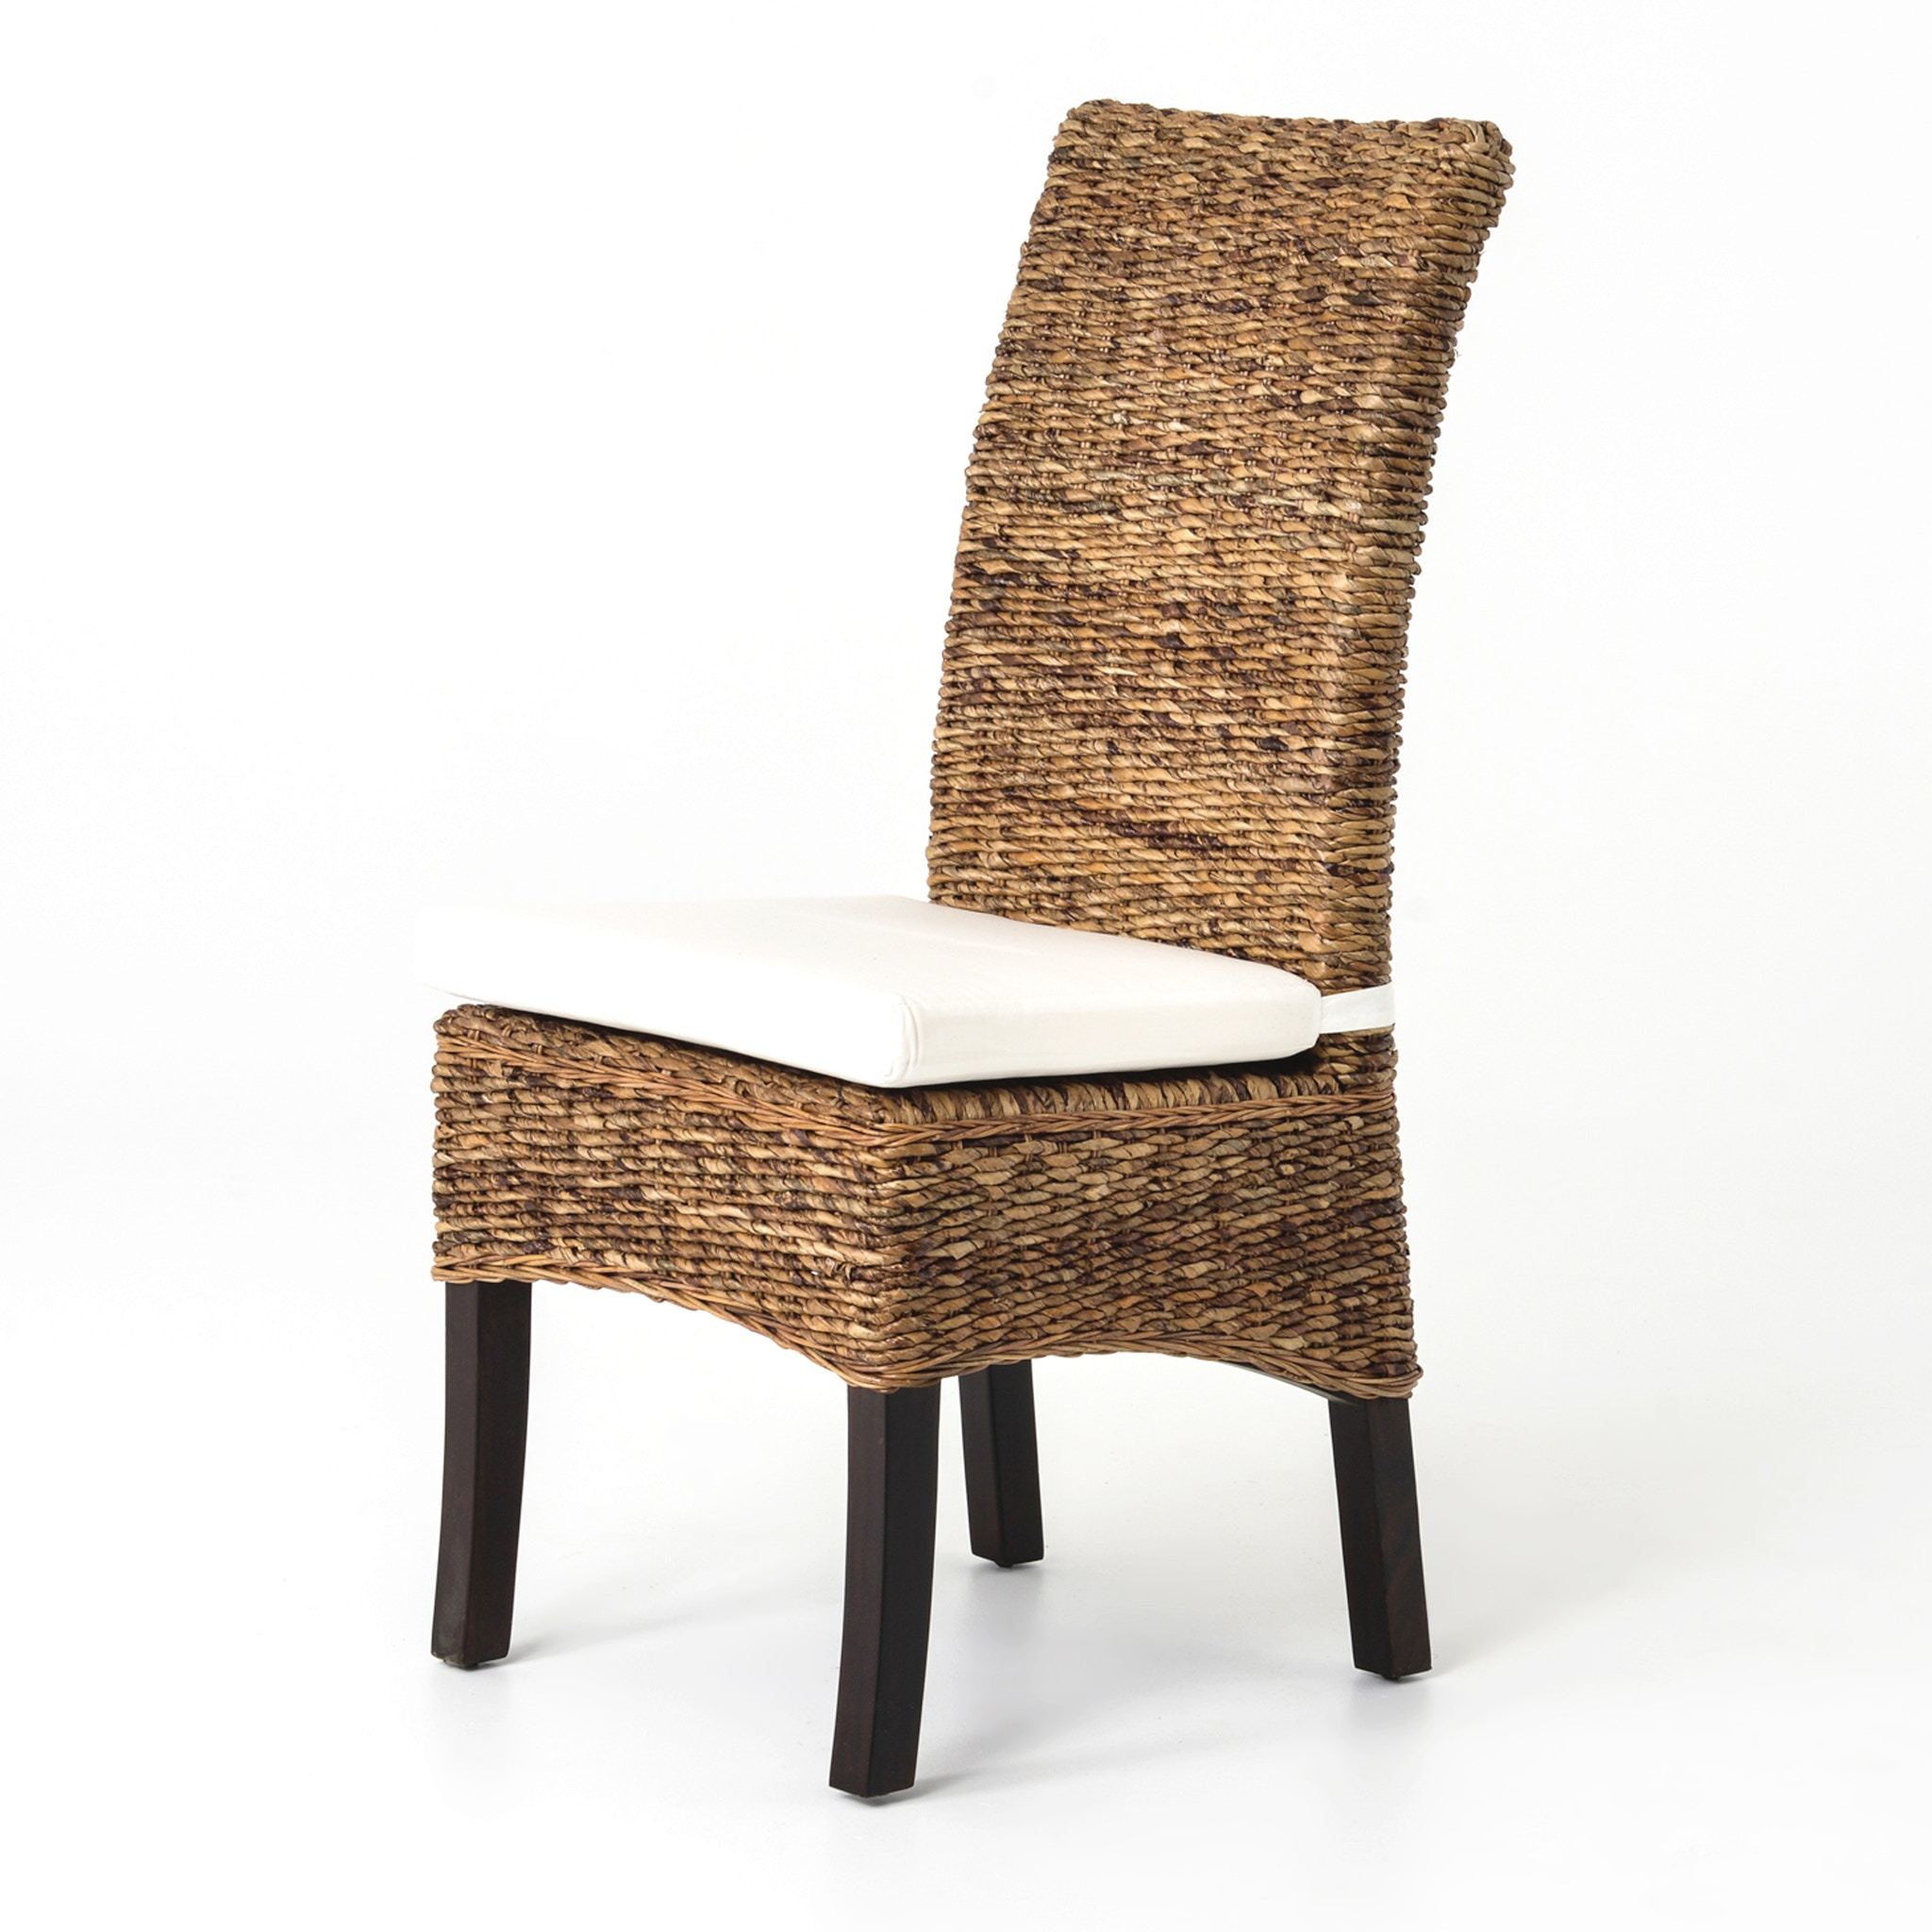 Four Hands Furniture Banana Leaf Chair With Cushion JCHR B1